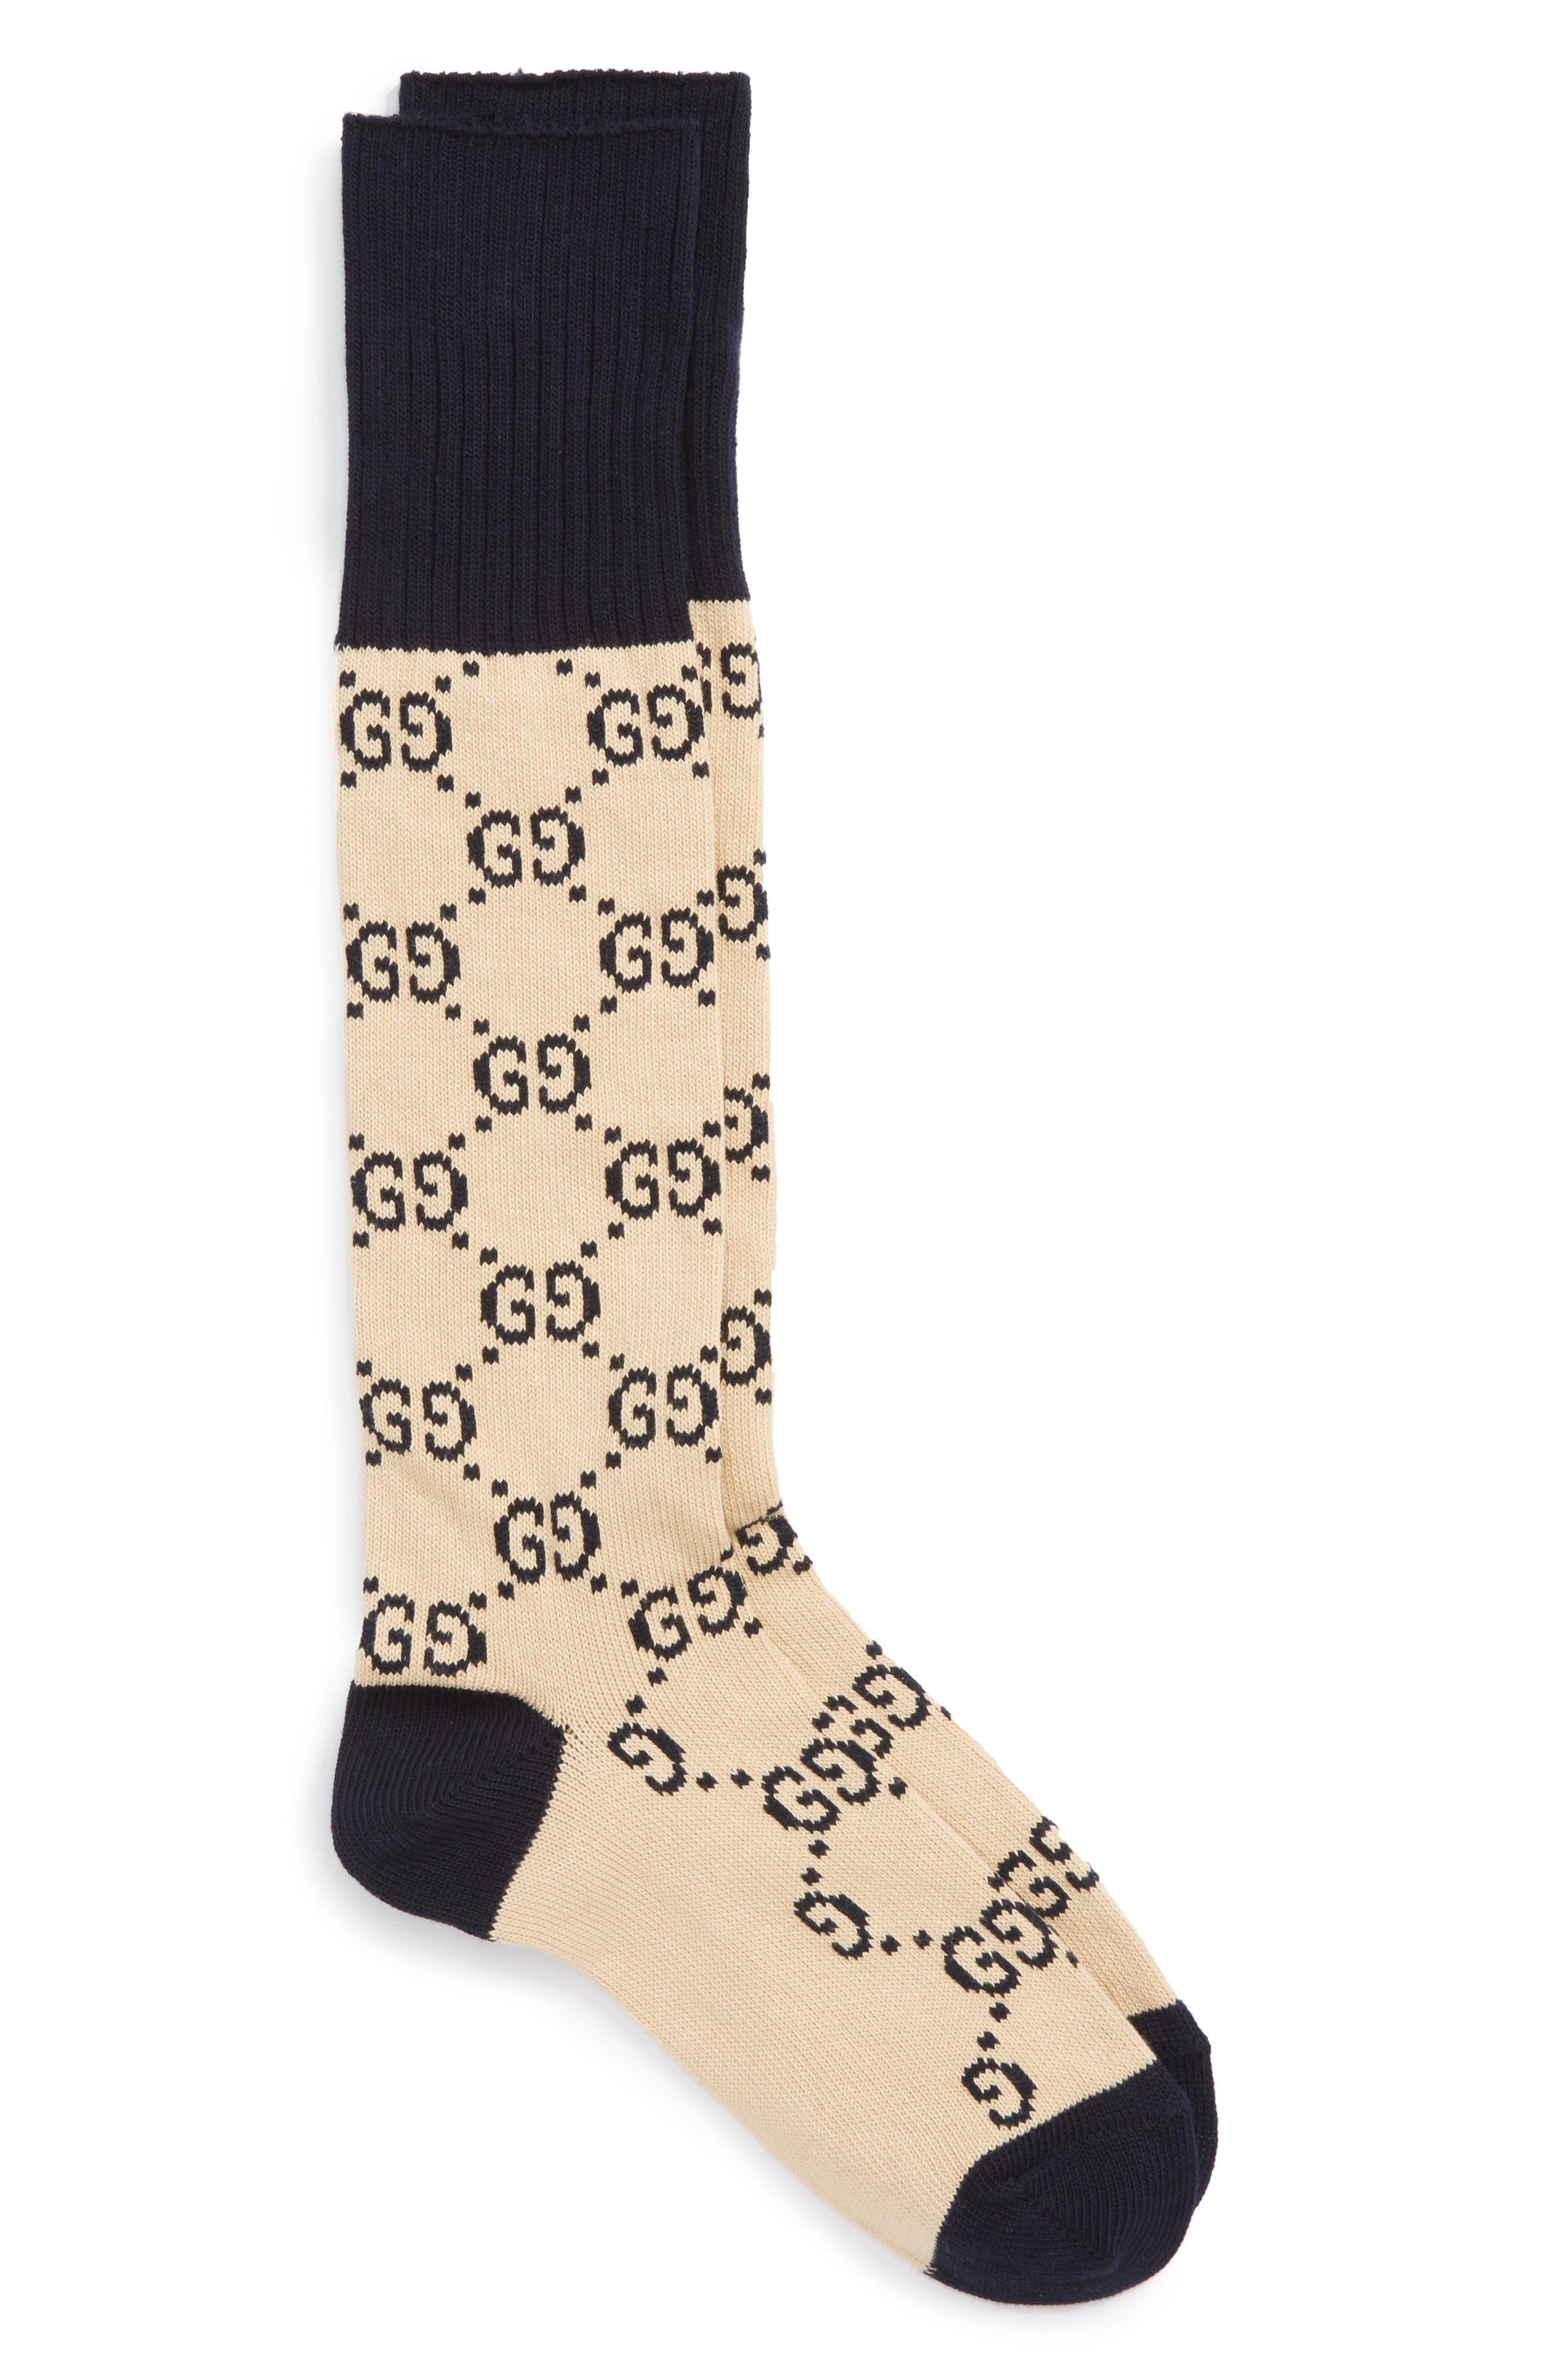 GG Socks,                         Main,                         color, 131